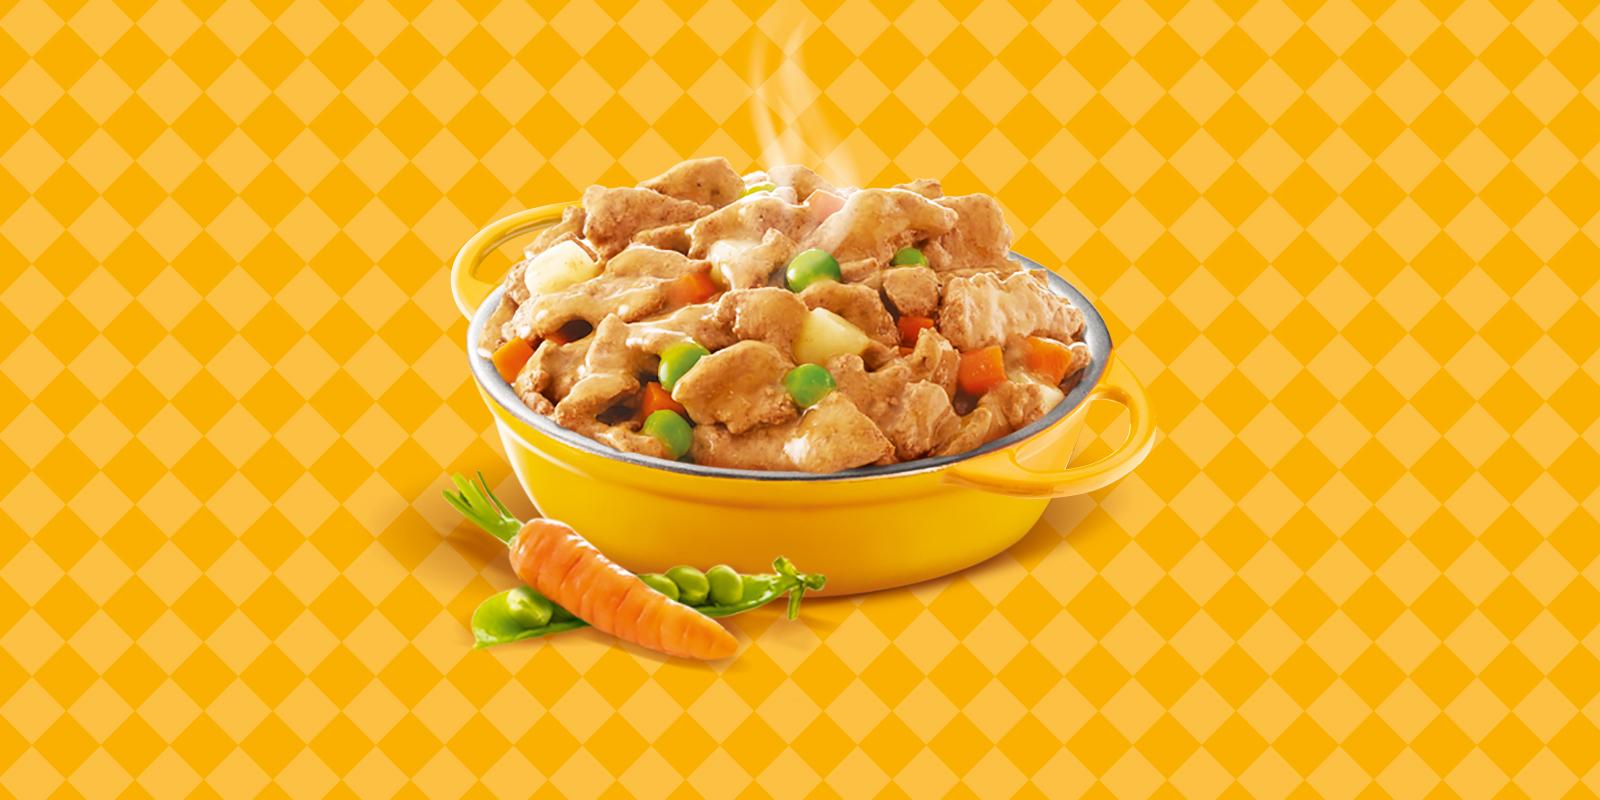 cesar-food-photography-chicken.jpg